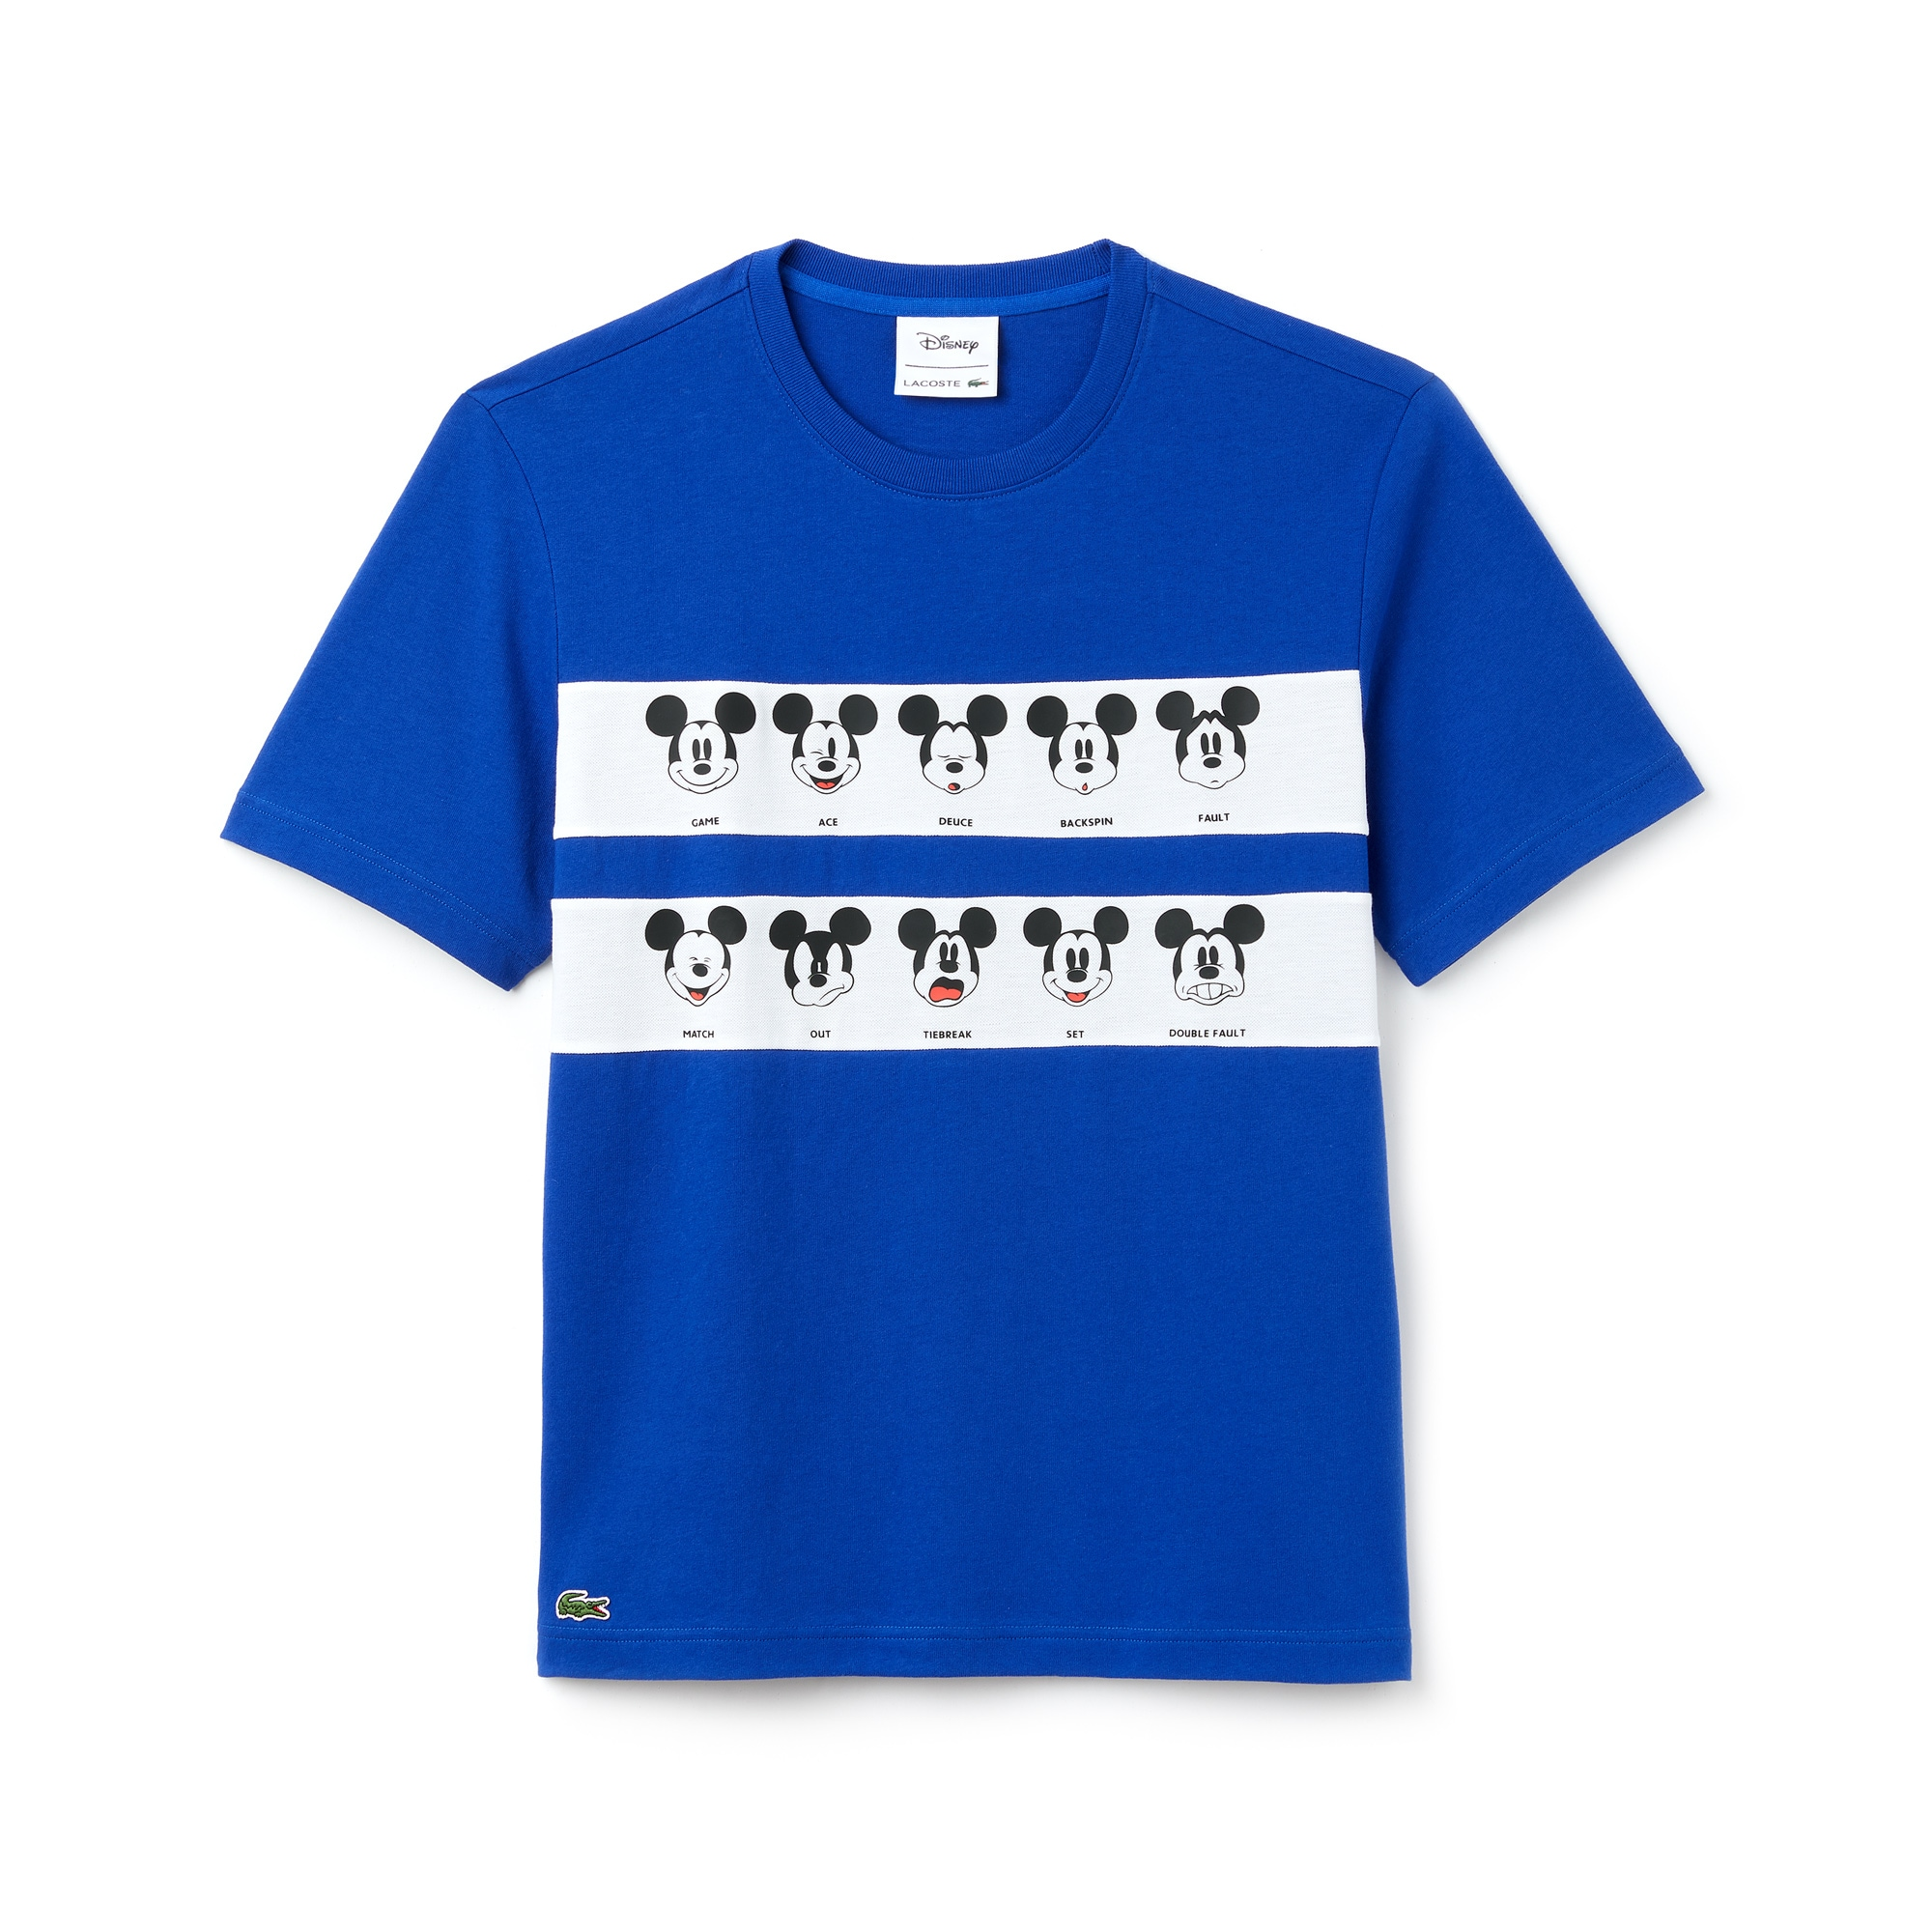 Men's Disney Mickey Graphic Band Cotton Jersey T-shirt